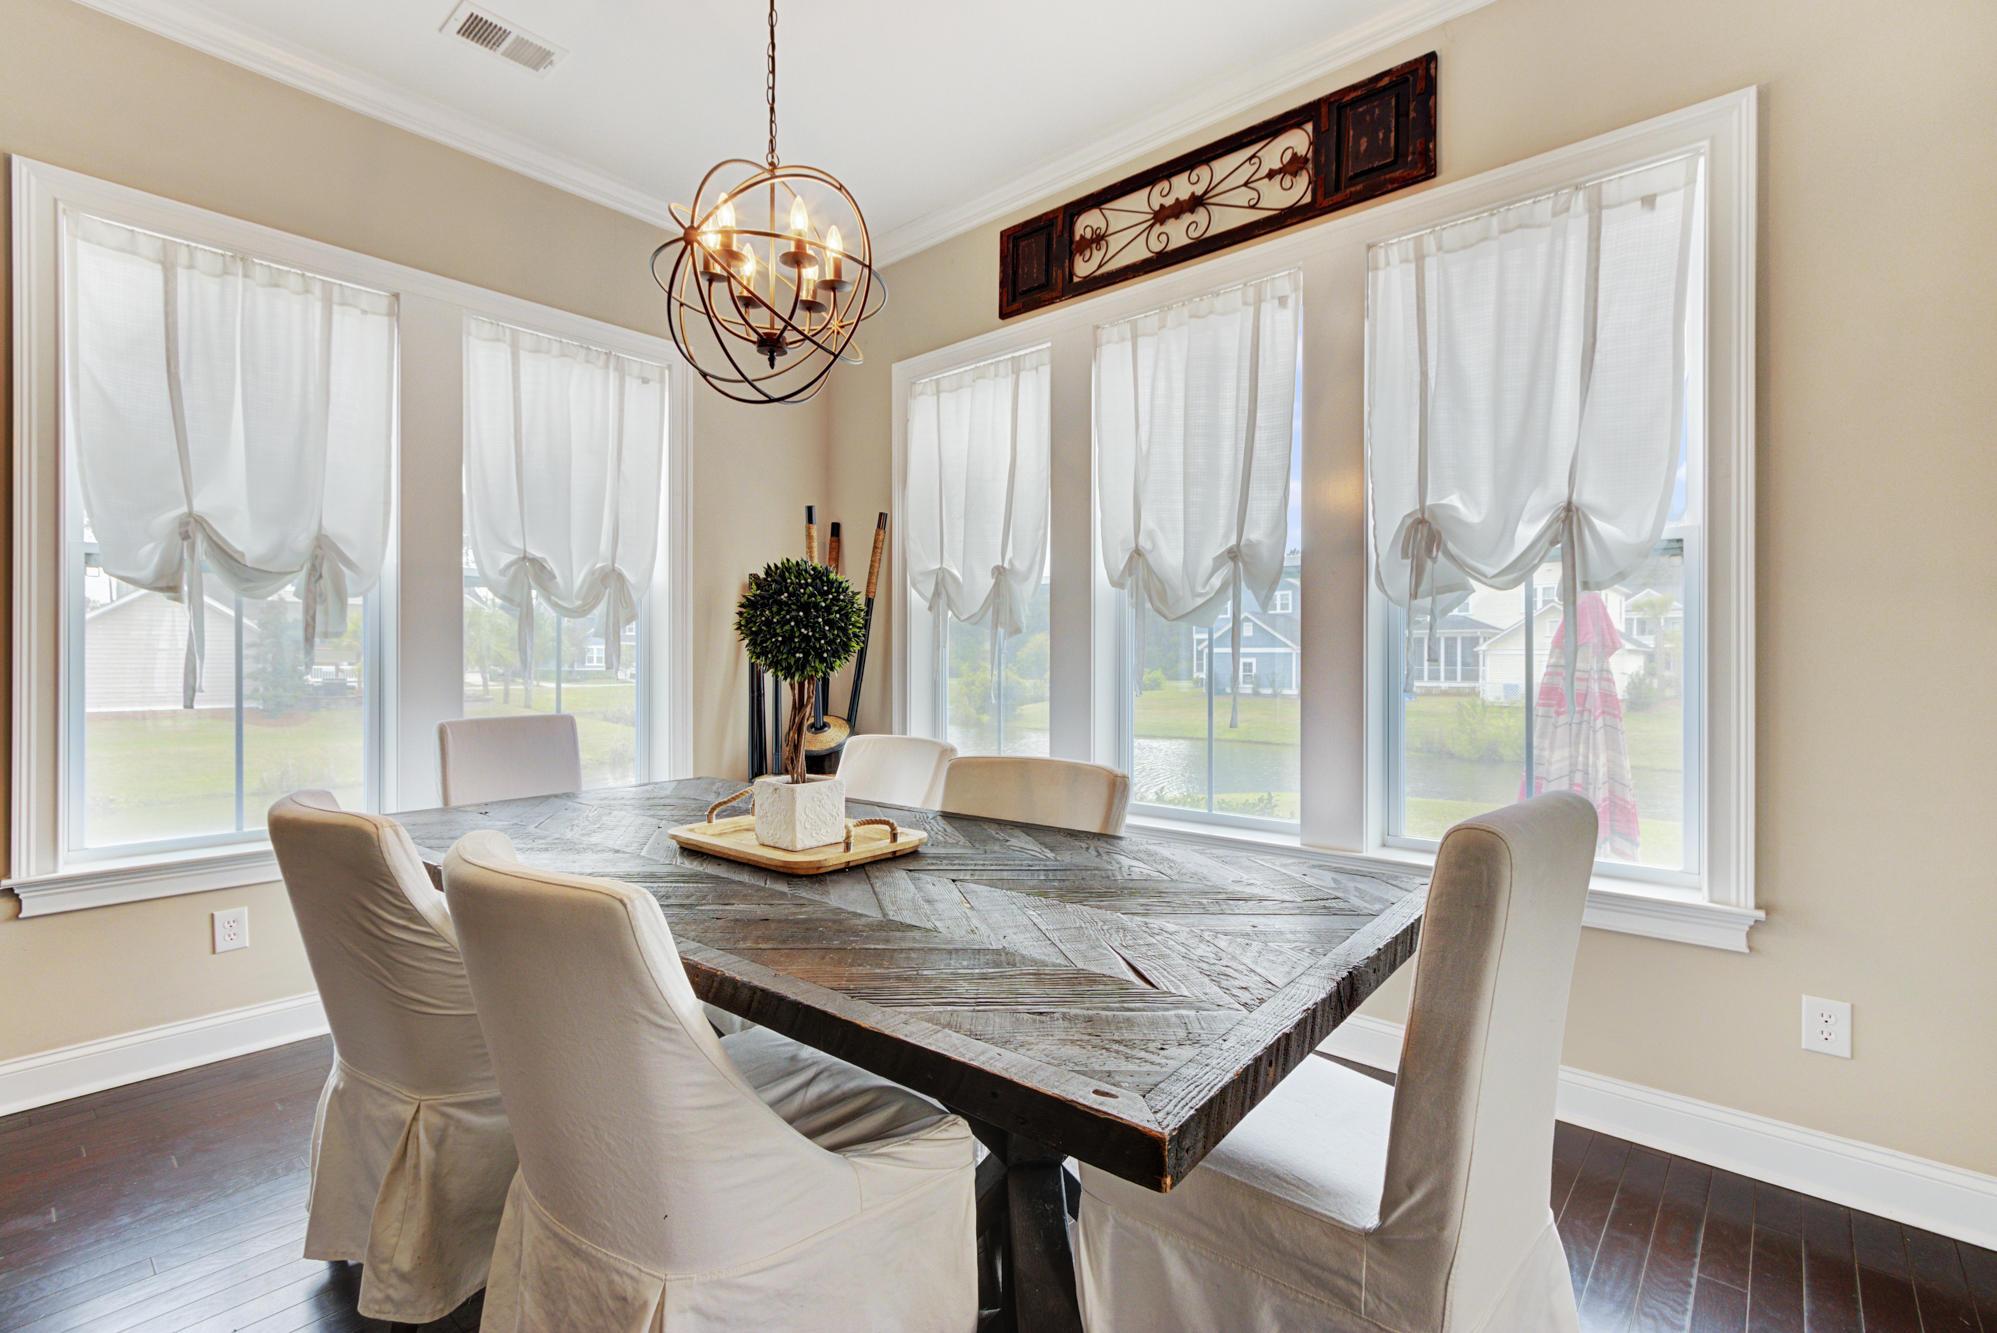 Carolina Park Homes For Sale - 3614 Shutesbury, Mount Pleasant, SC - 25